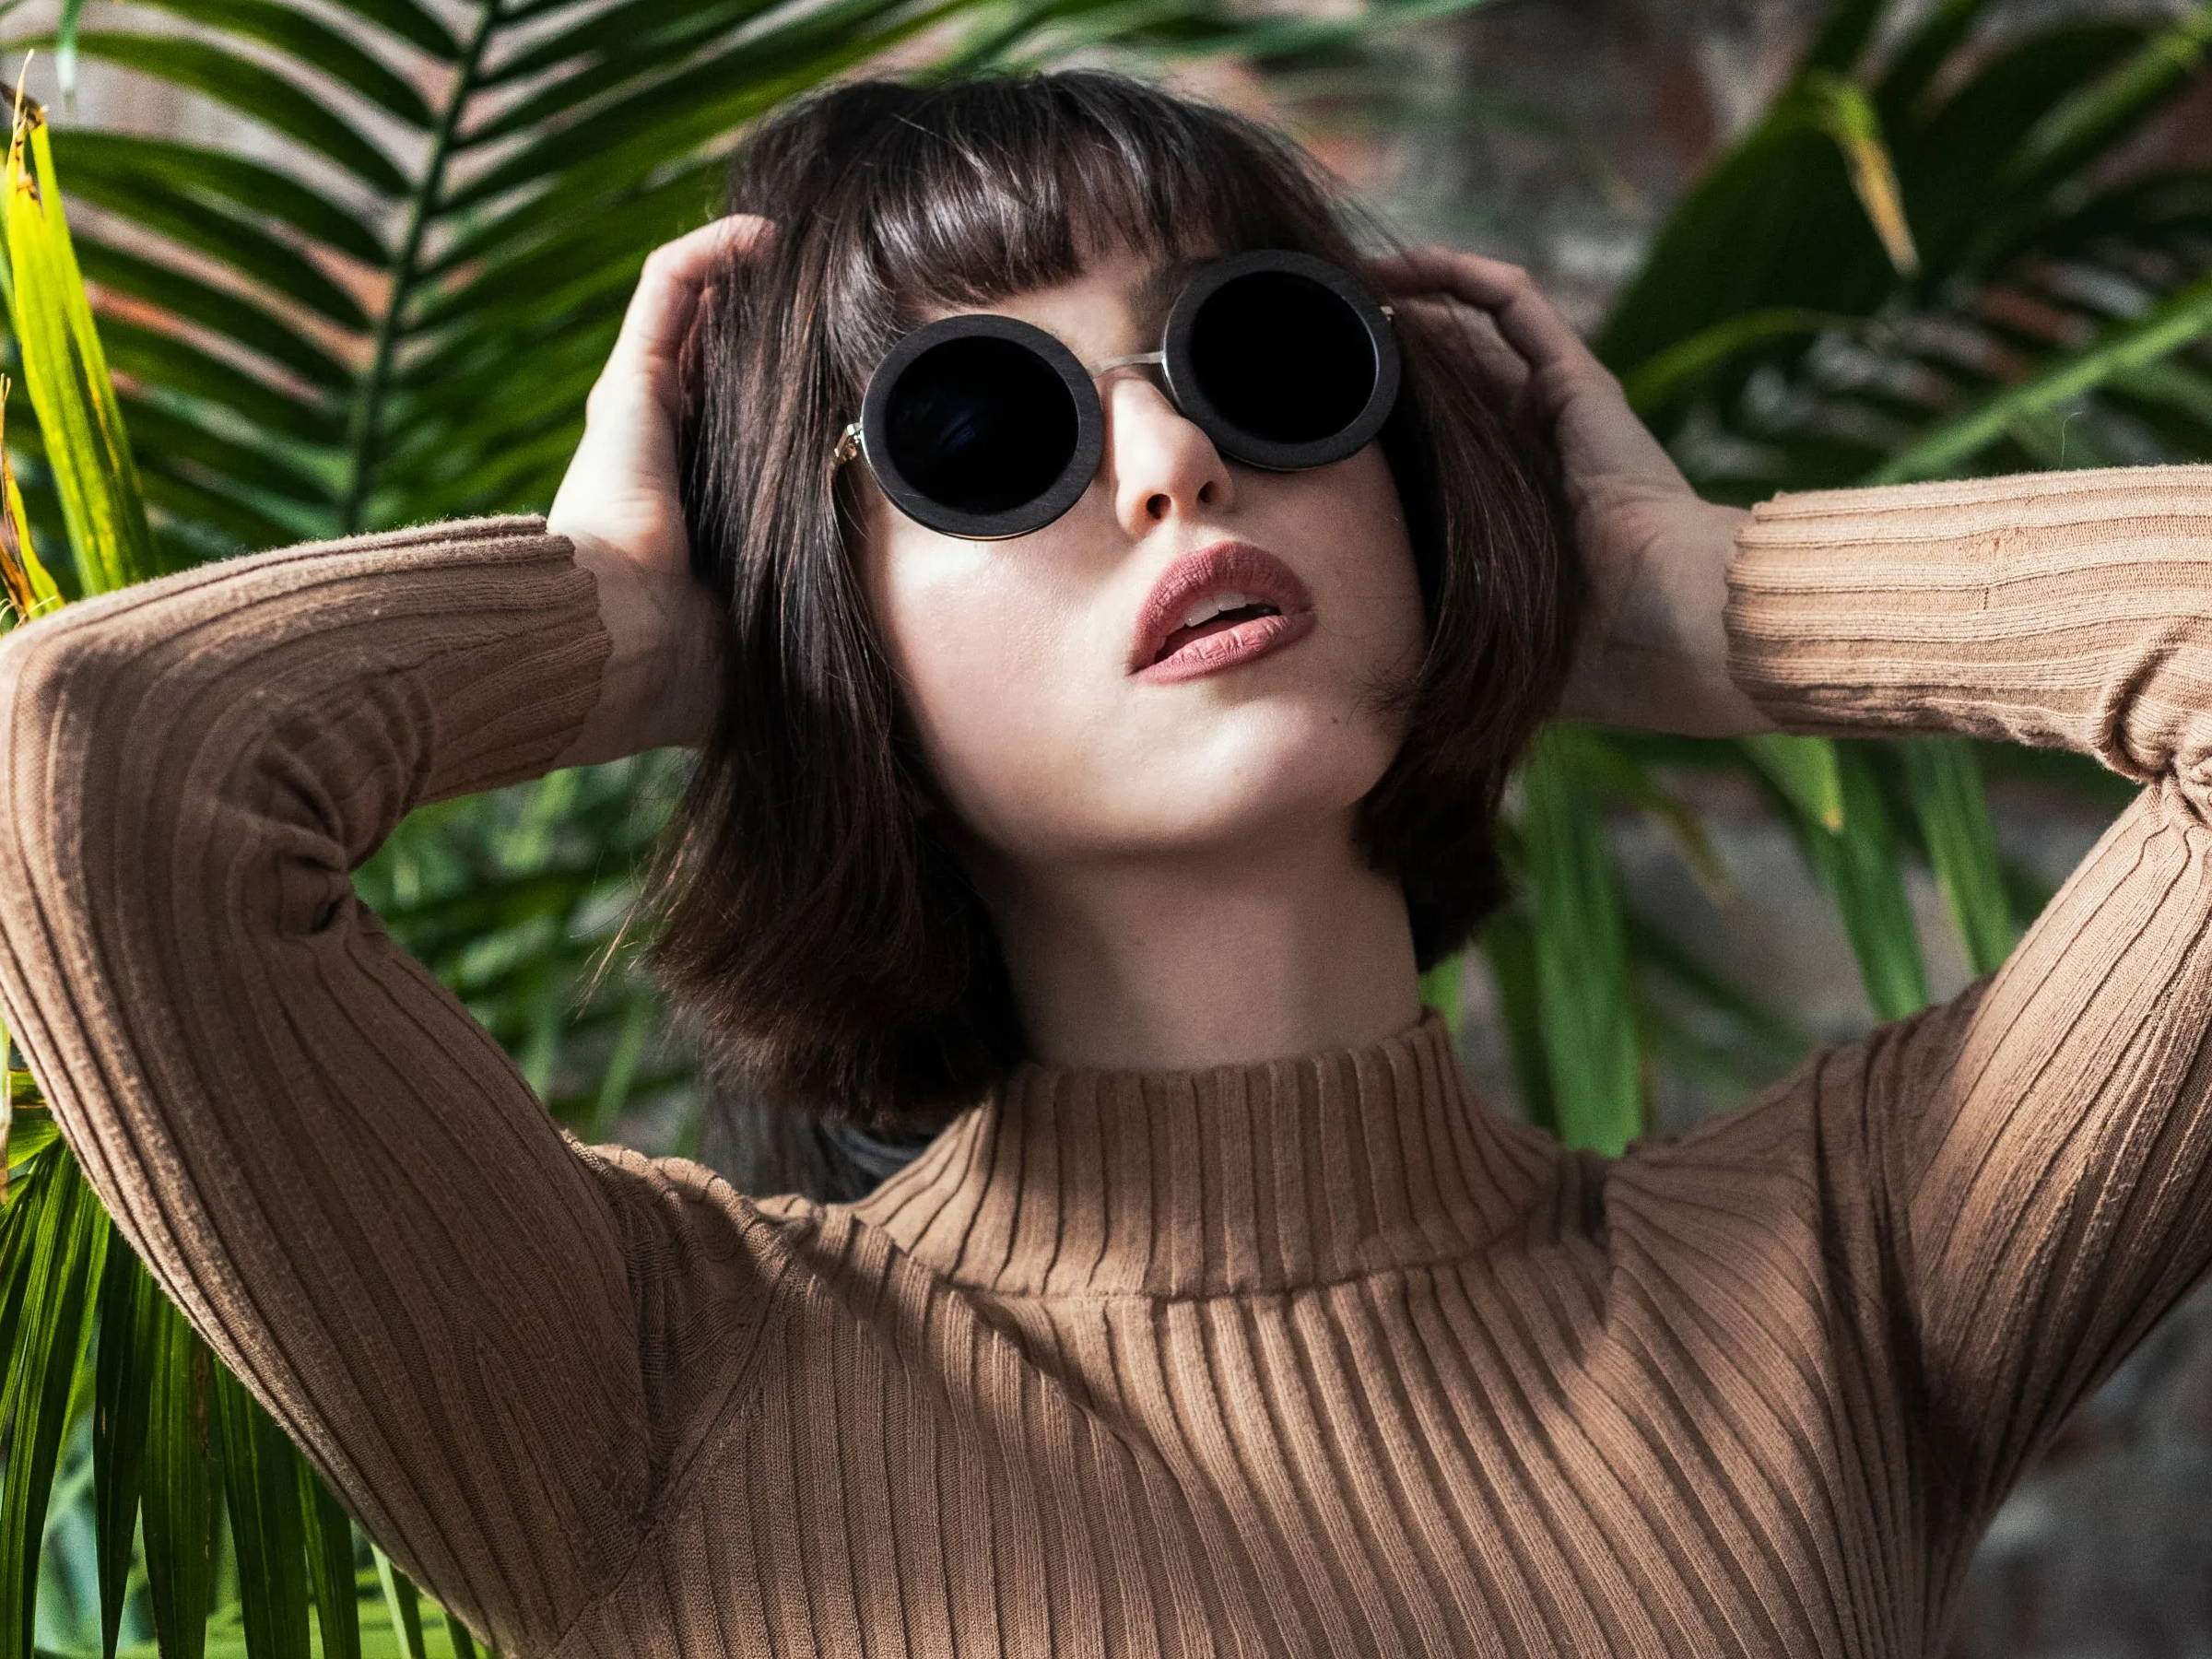 Woman wearing Kraywoods Birch, Oversized Round Sunglasses made from Ebony wood with polarized lenses